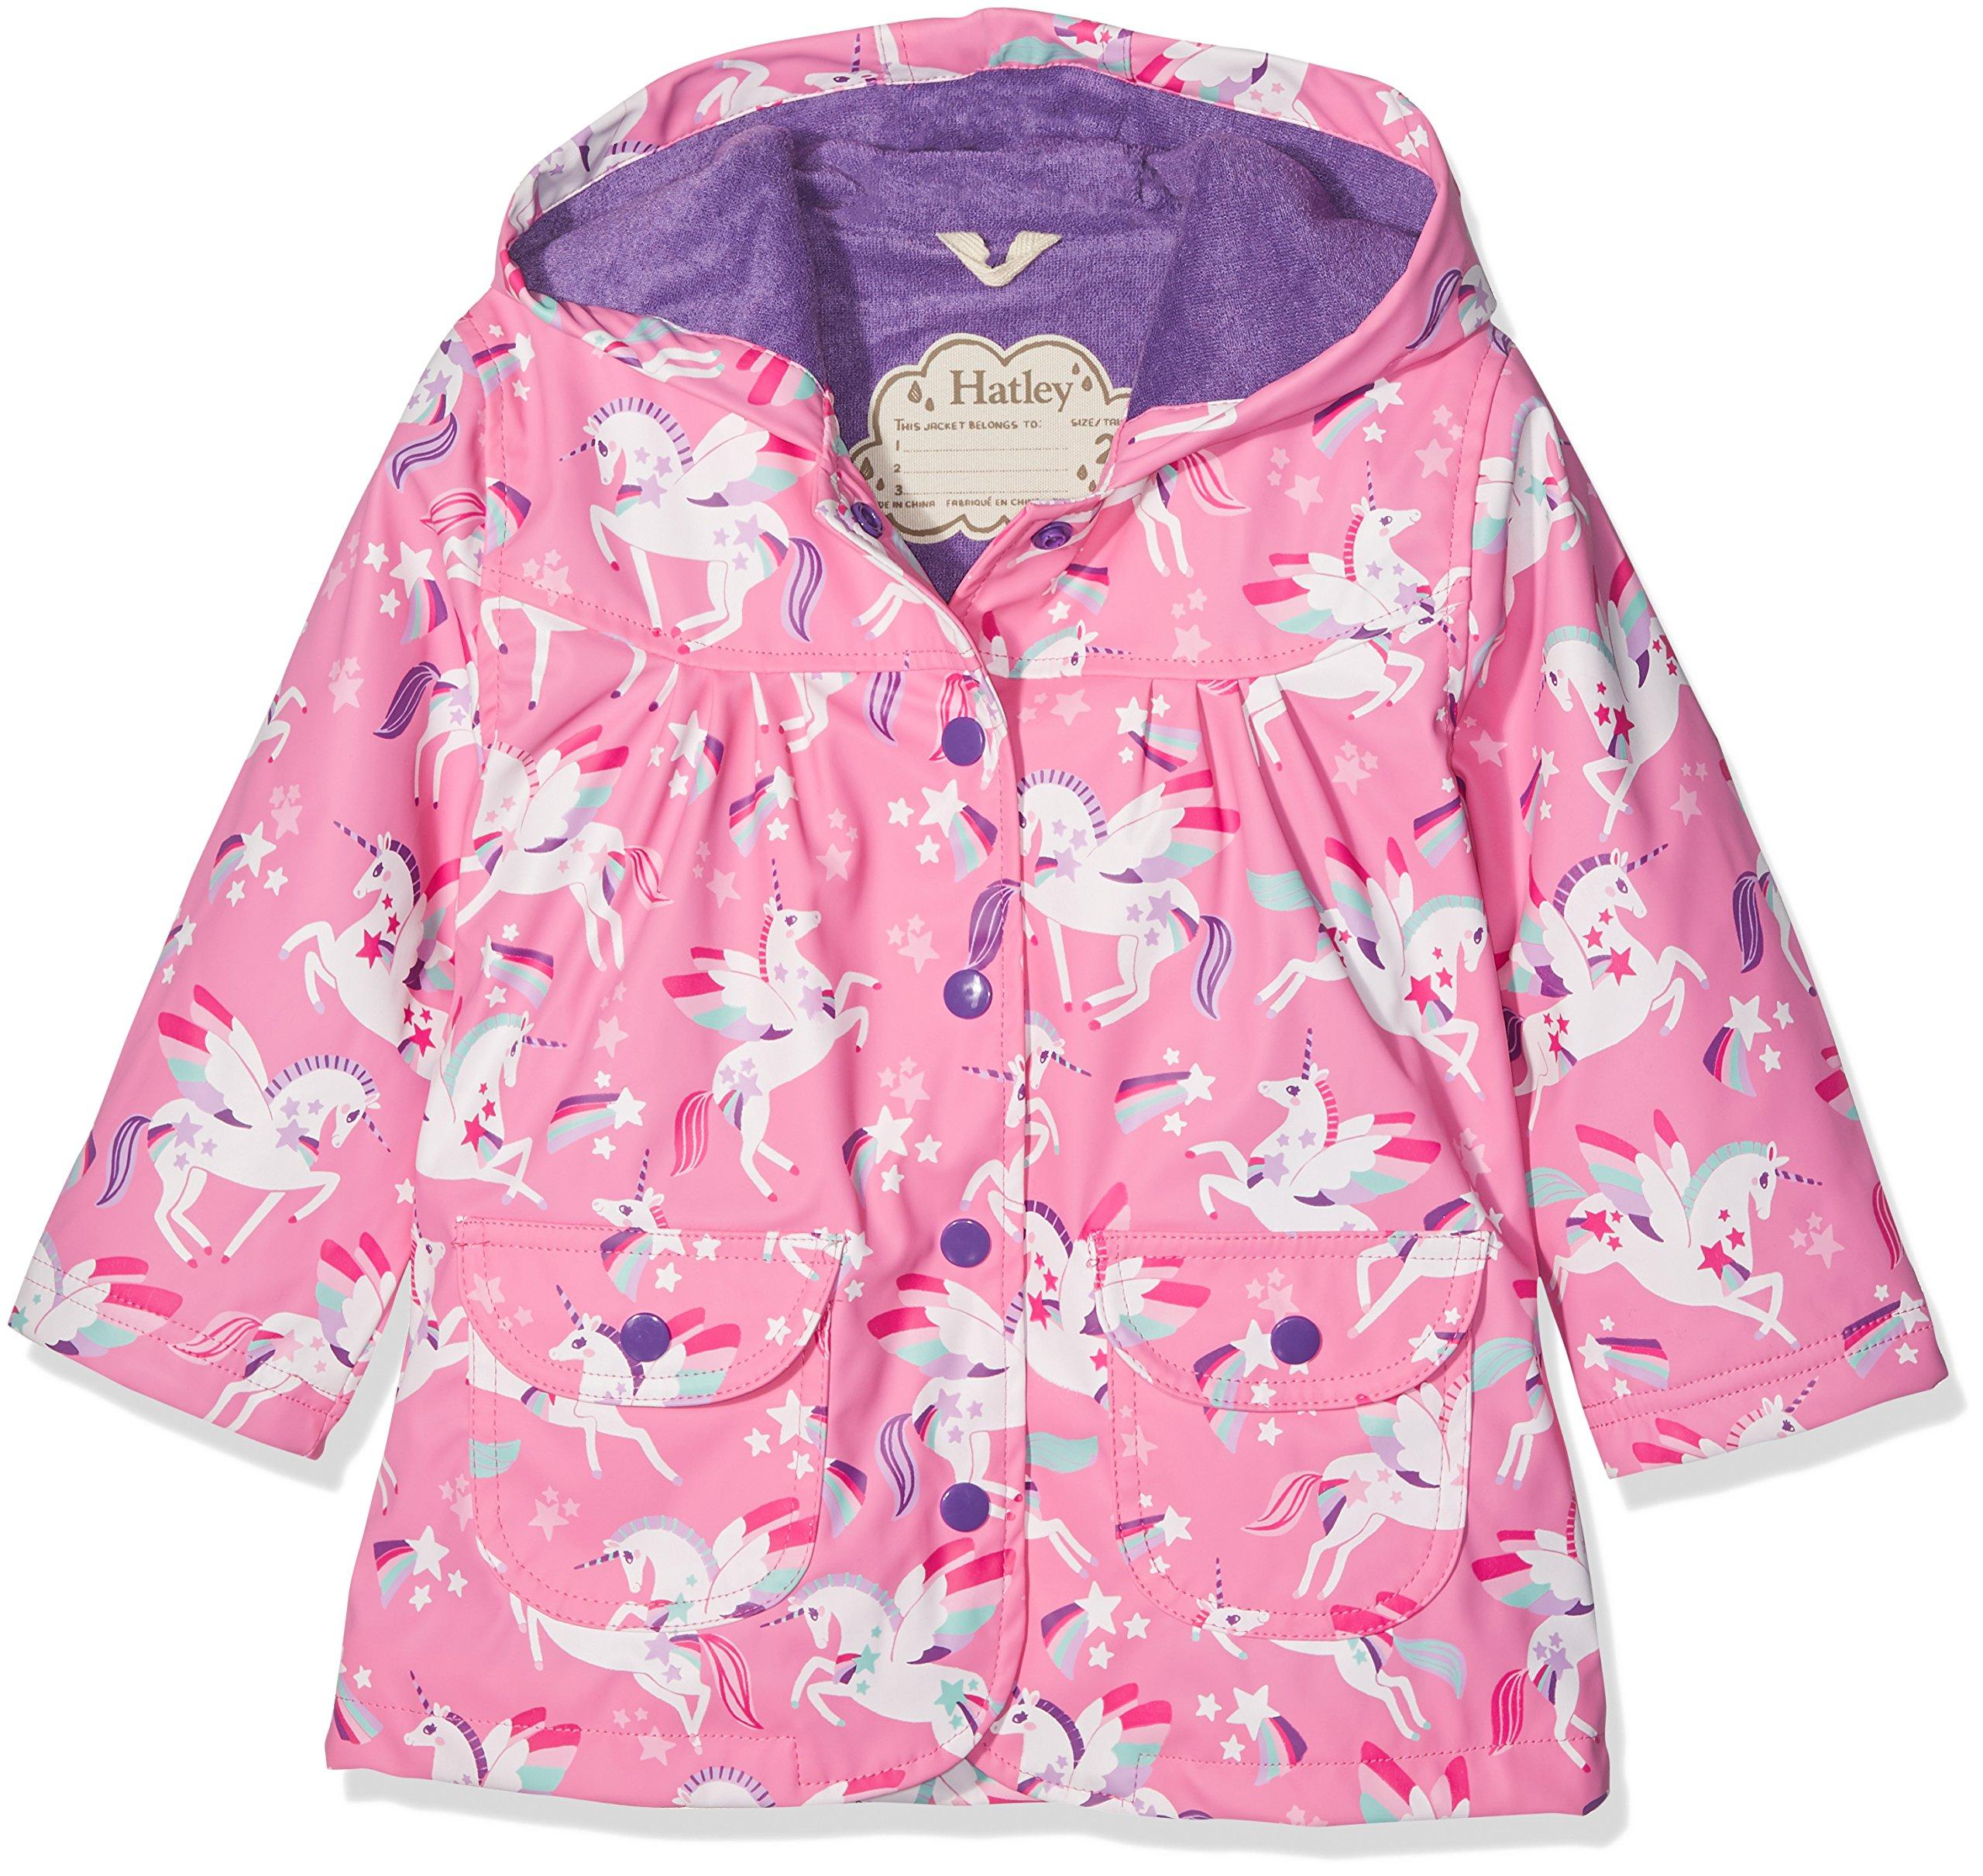 406cc7cf5b12 Galleon - Hatley Little Girls  Printed Raincoats